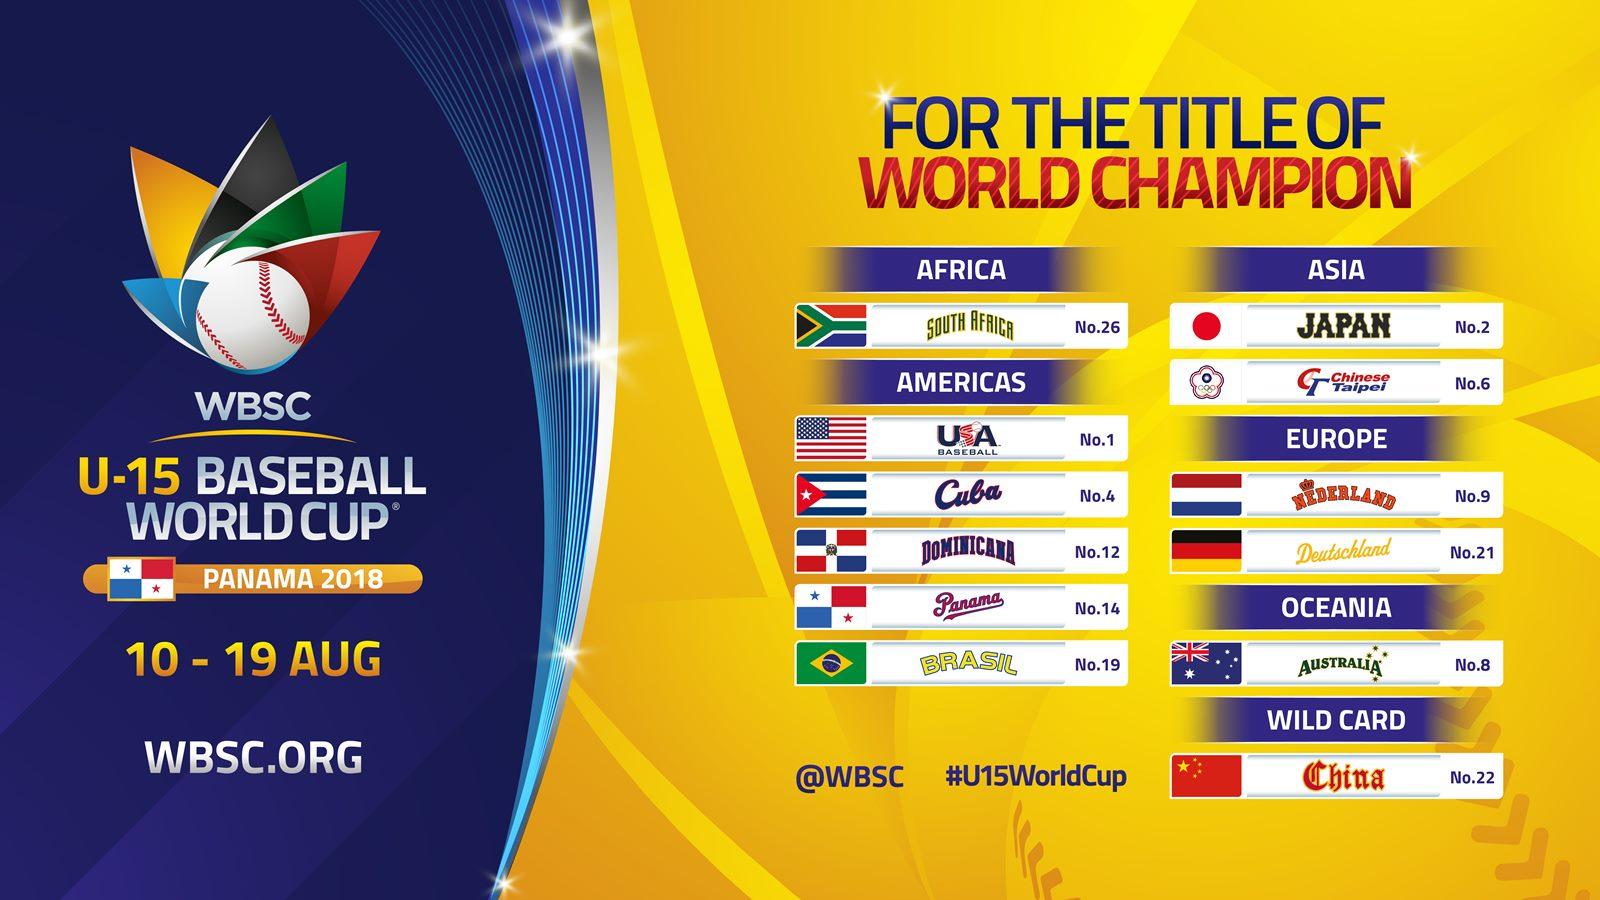 Fantastic China World Cup 2018 - Nations-by-Continent-WBSC-U-15-Baseball-World-Cup-2018-Panama-web  Pic_93934 .jpg